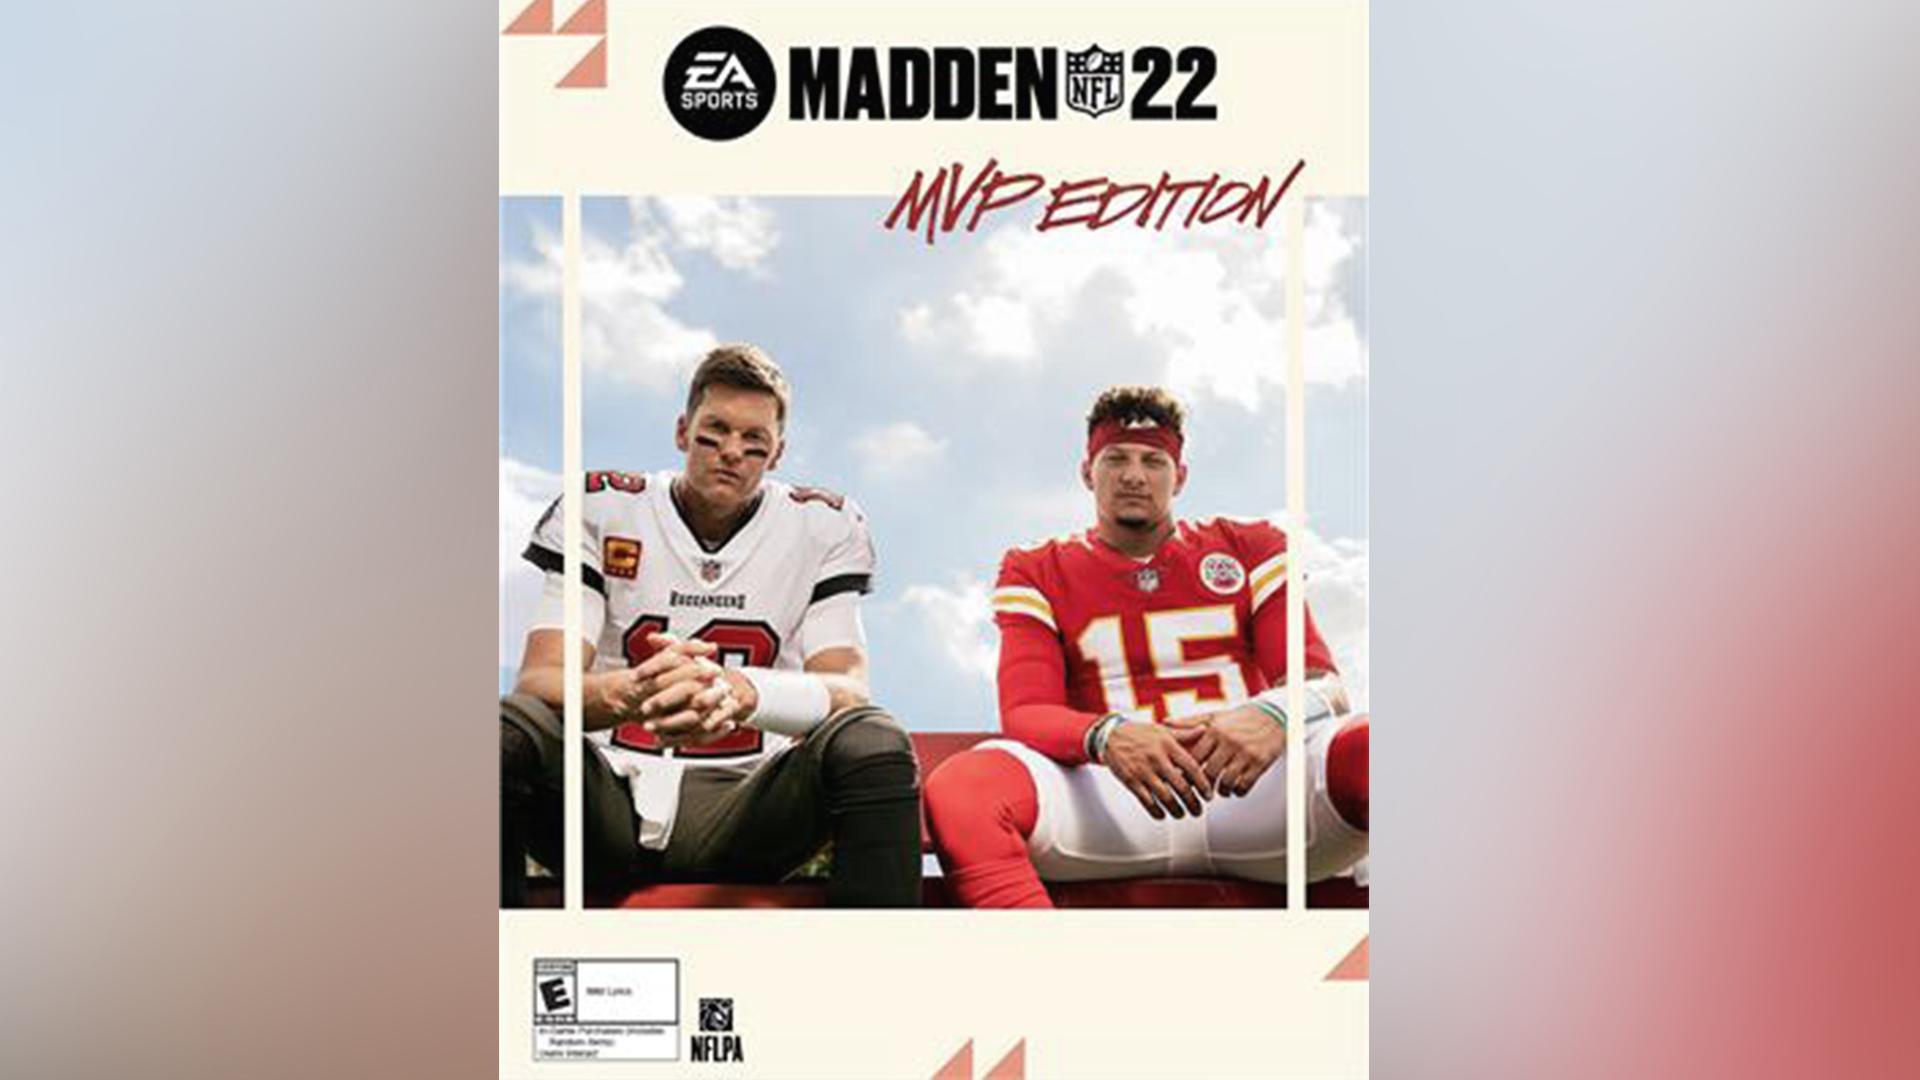 Tom Brady y Patrick Mahomes aparecen como atletas de portada de ...